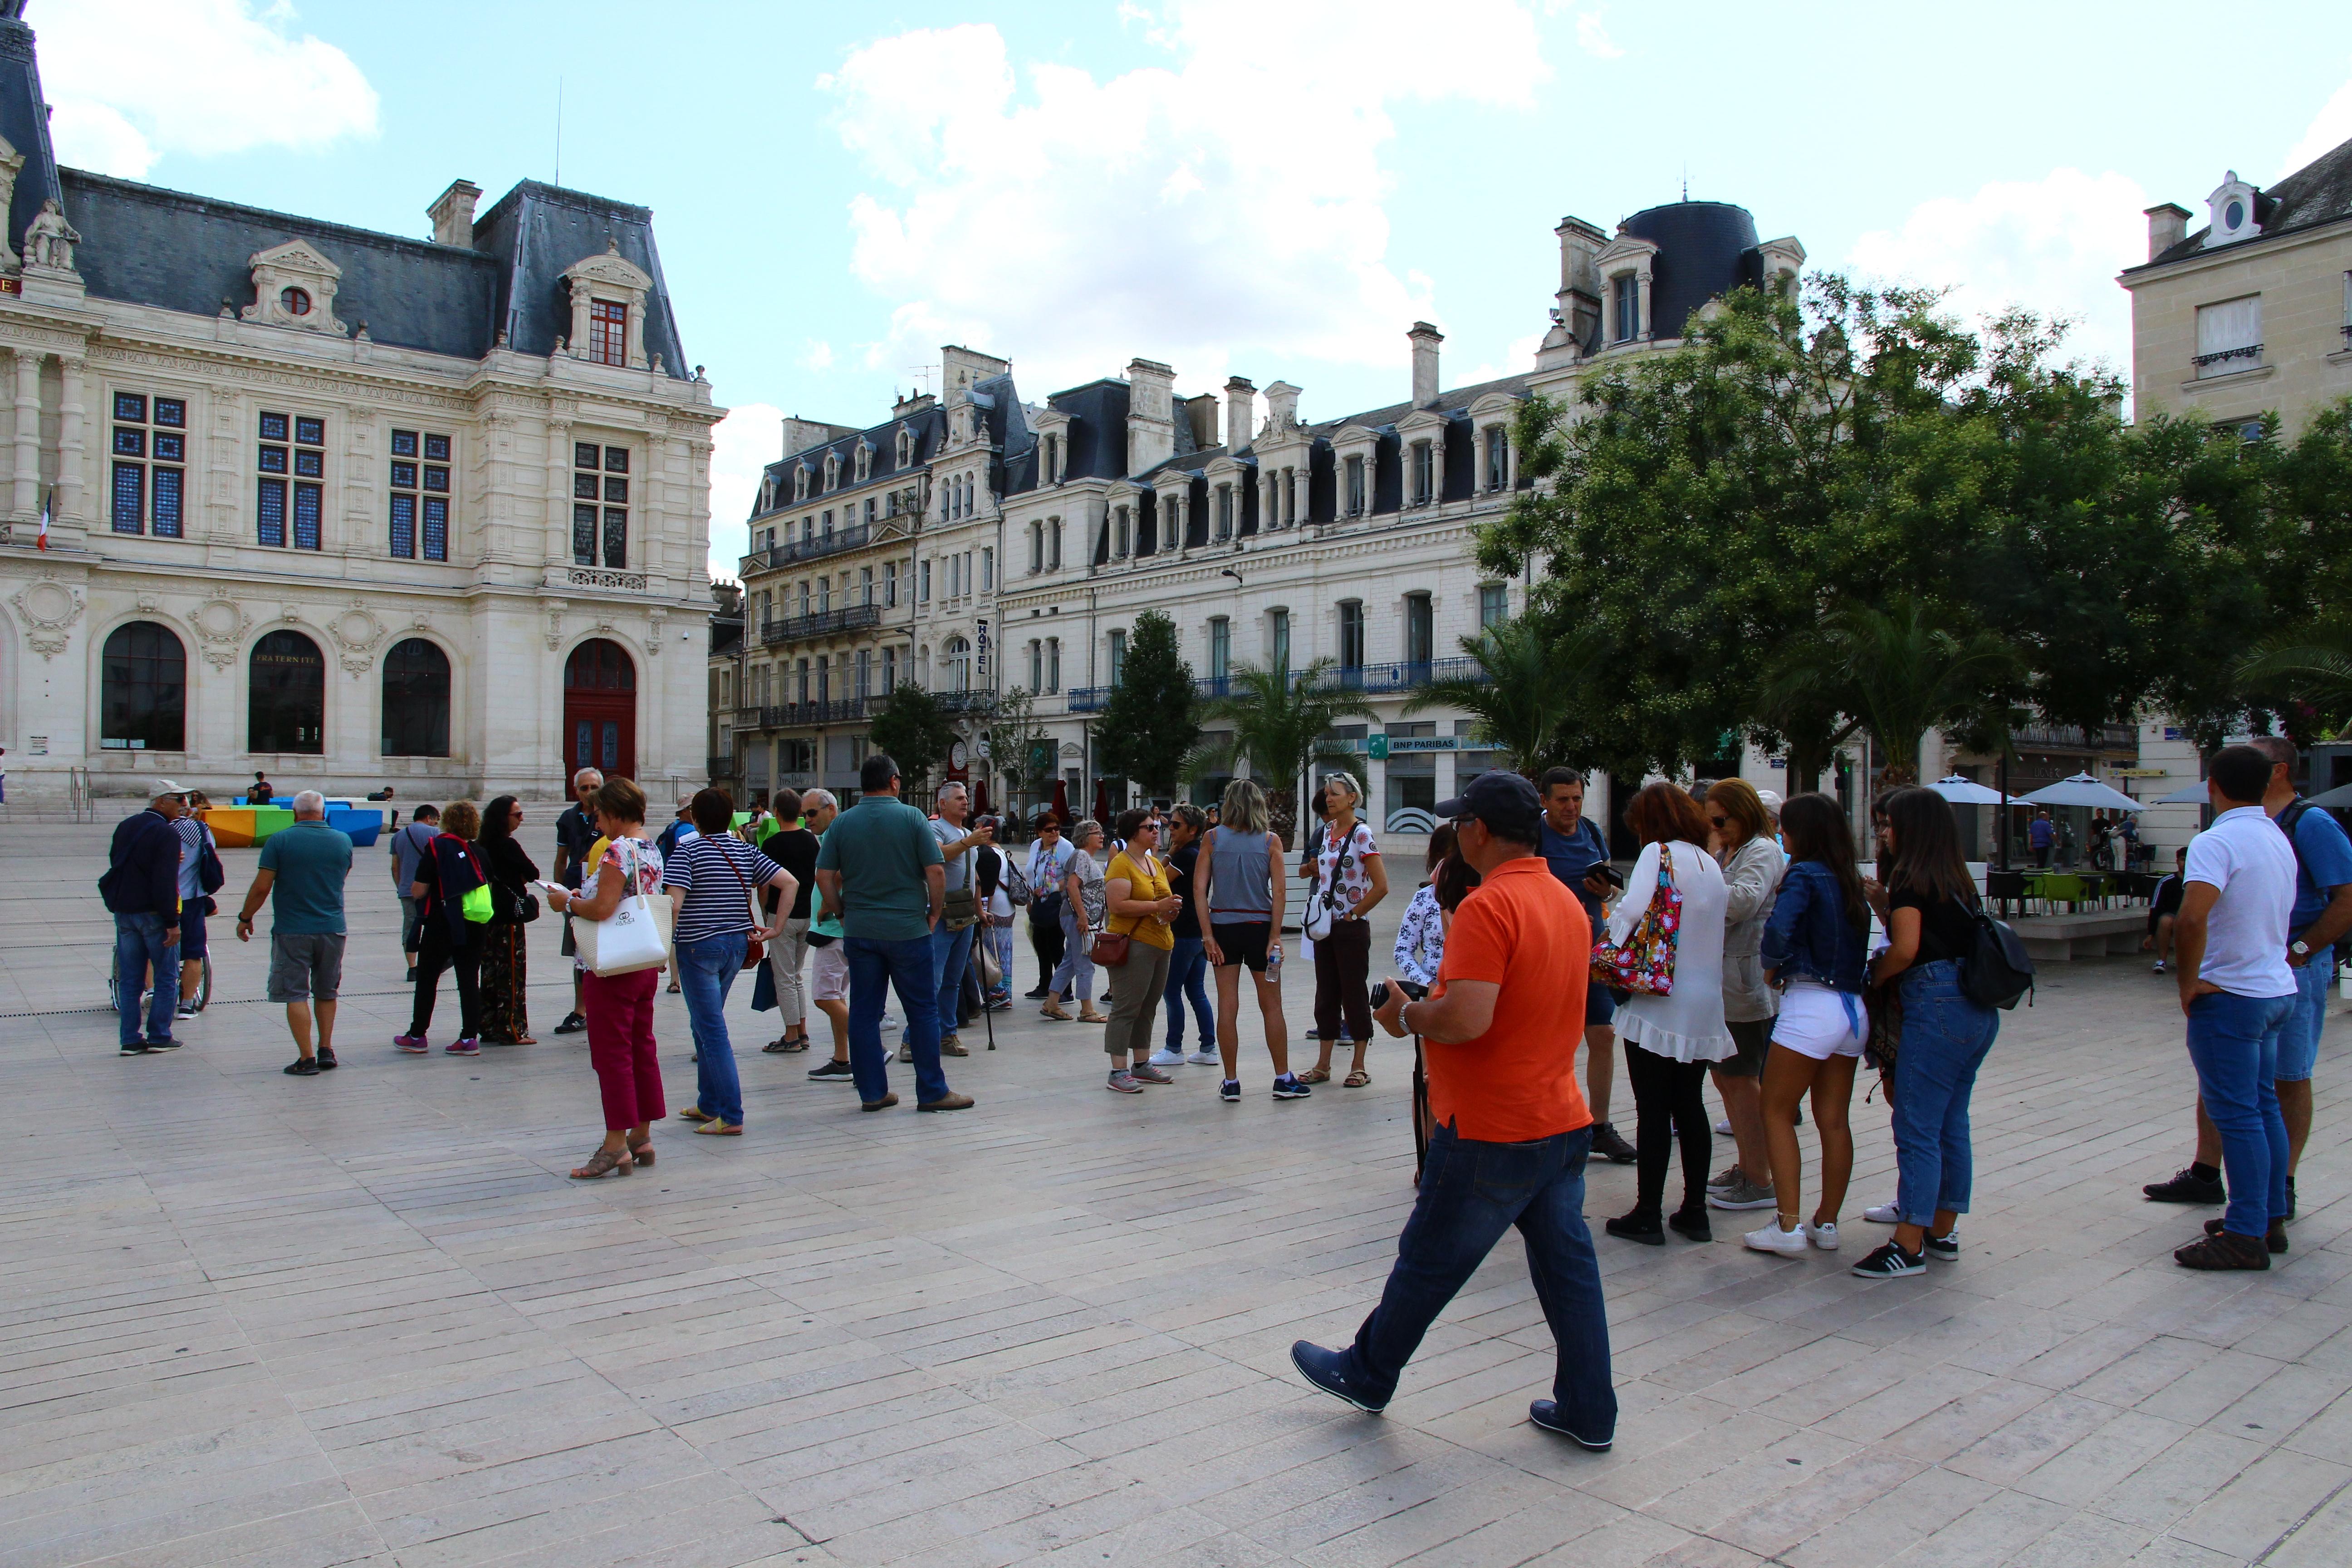 03-MARDI-ilot-ison-Poitiers-Hotel-de-Ville-IMG_2645